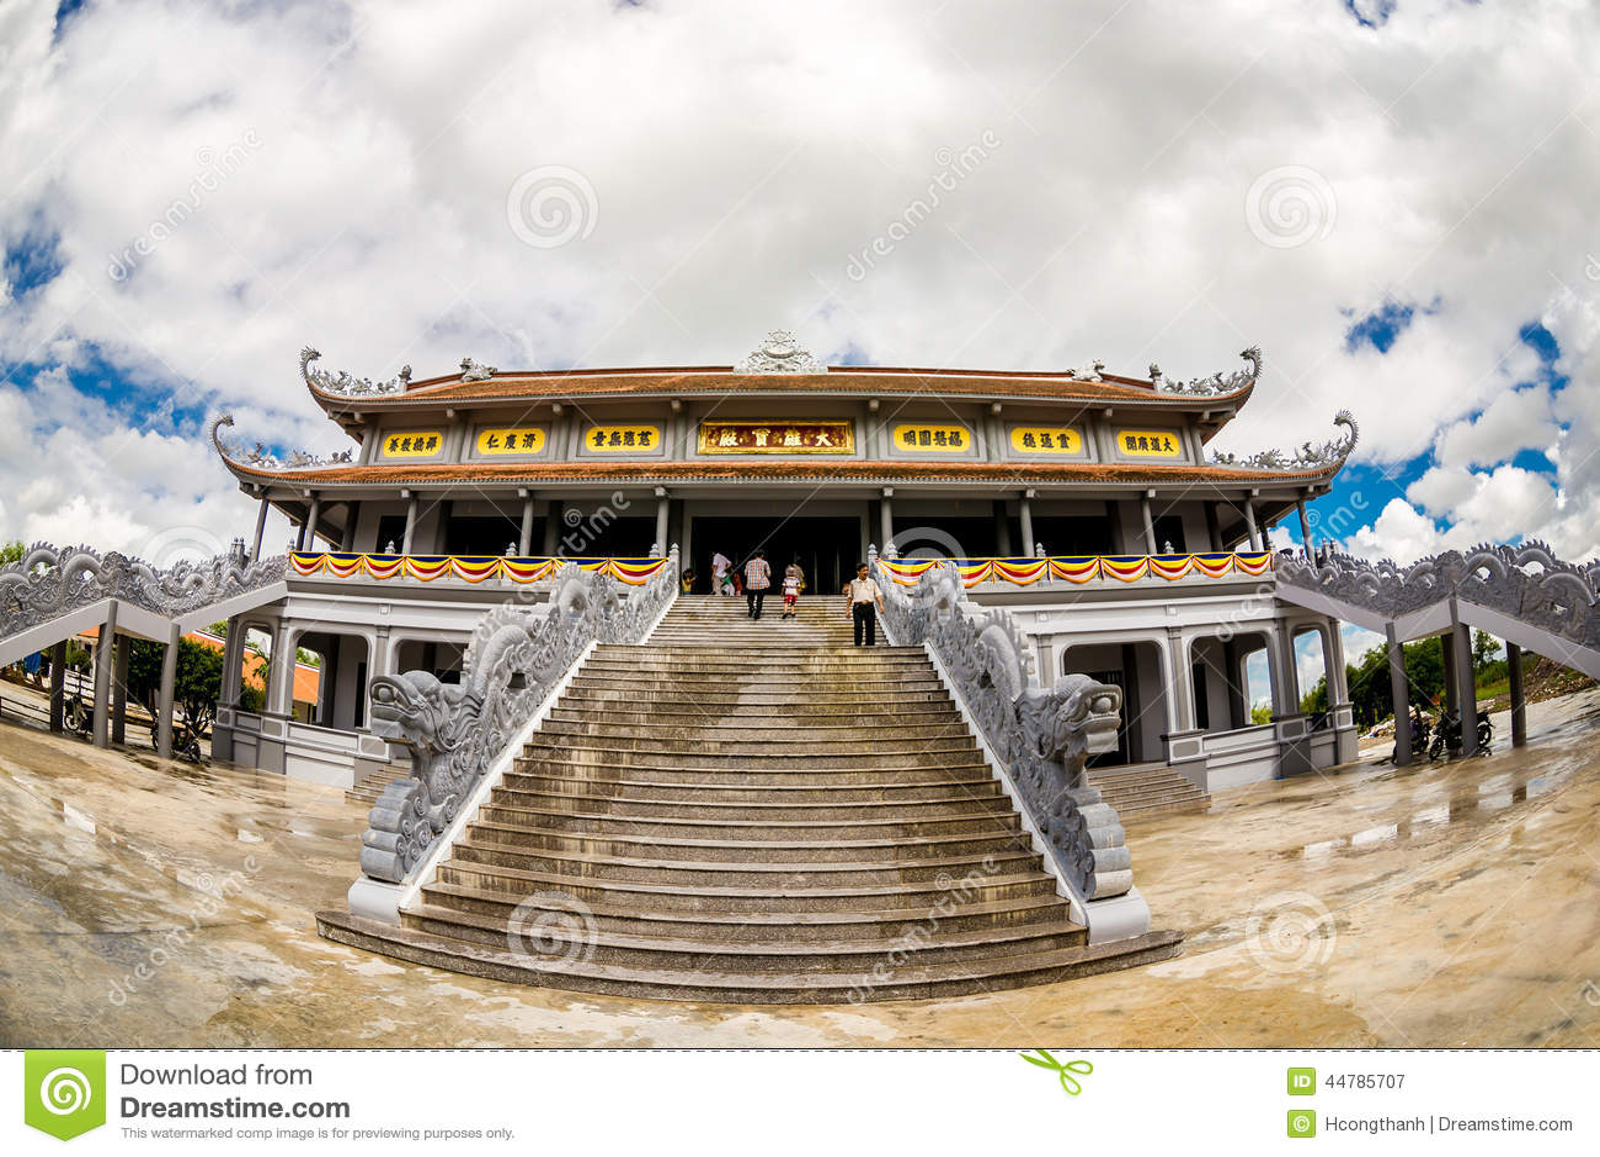 NAMDINH, VIETNAM - SEPTEMBER 2, 2014 - Main Pagoda in Truc Lam Thien Truong.